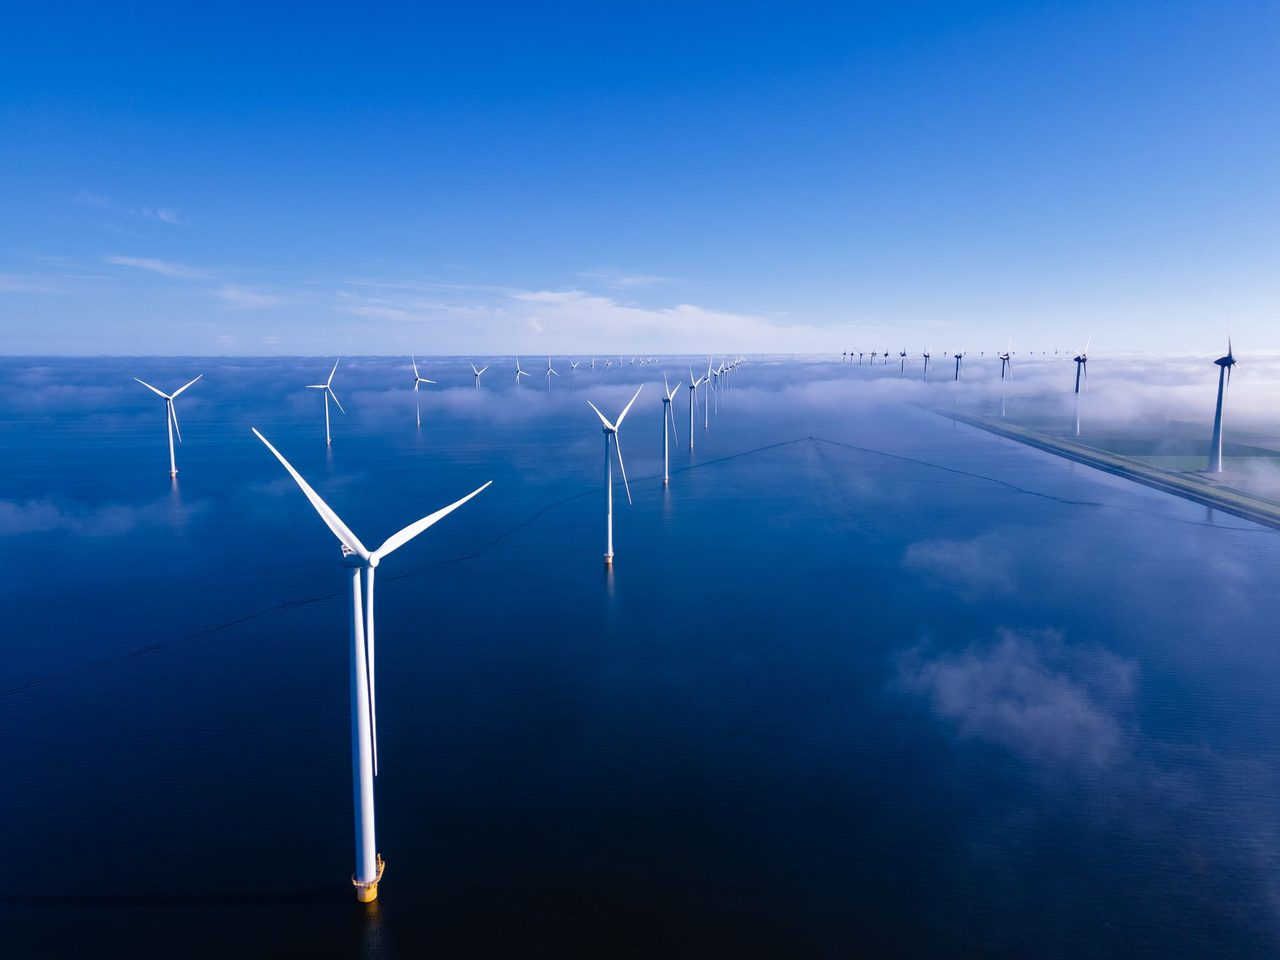 Wind turbines in the ocean